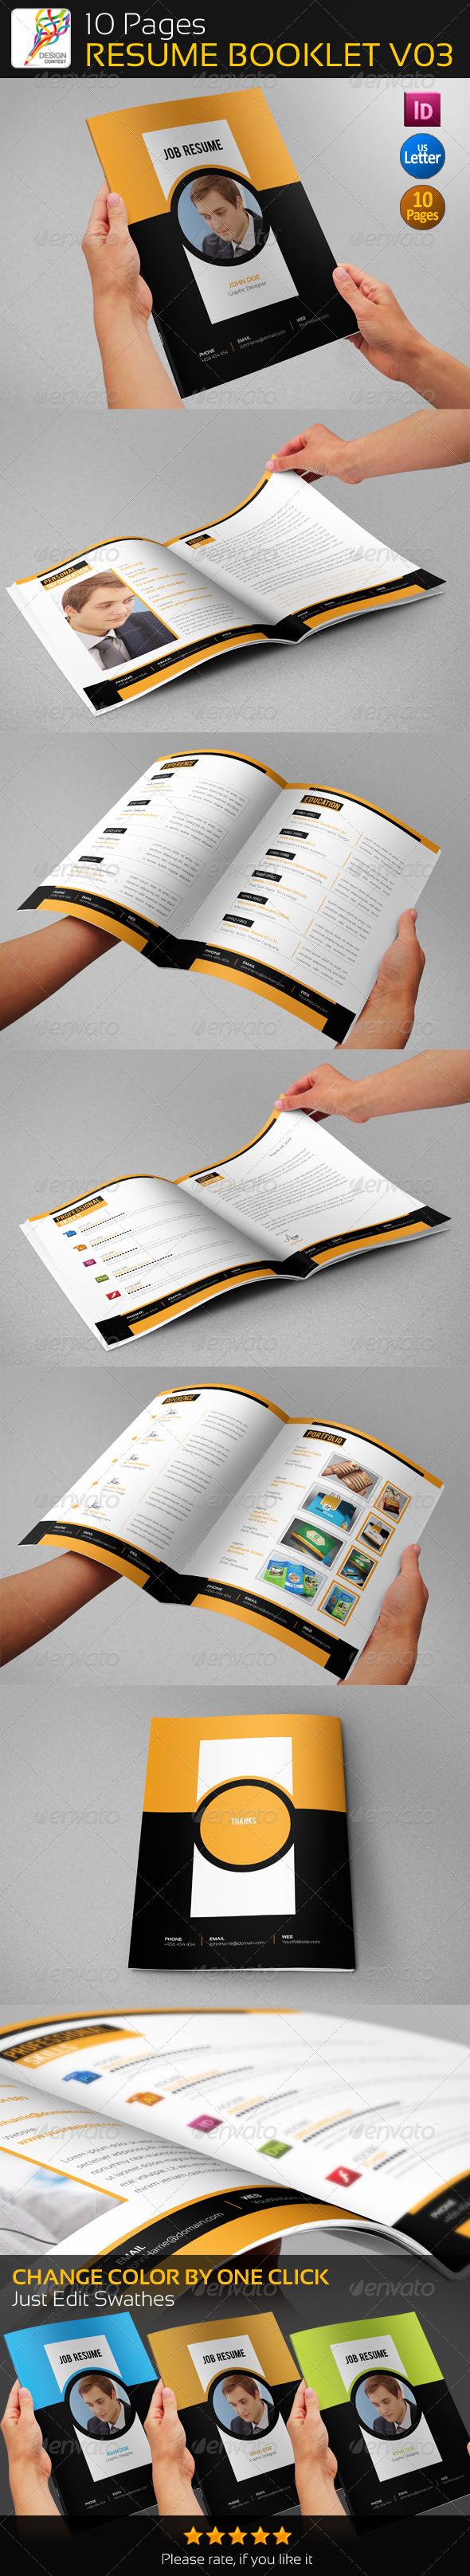 10 Pages Professional Resume Booklet V03